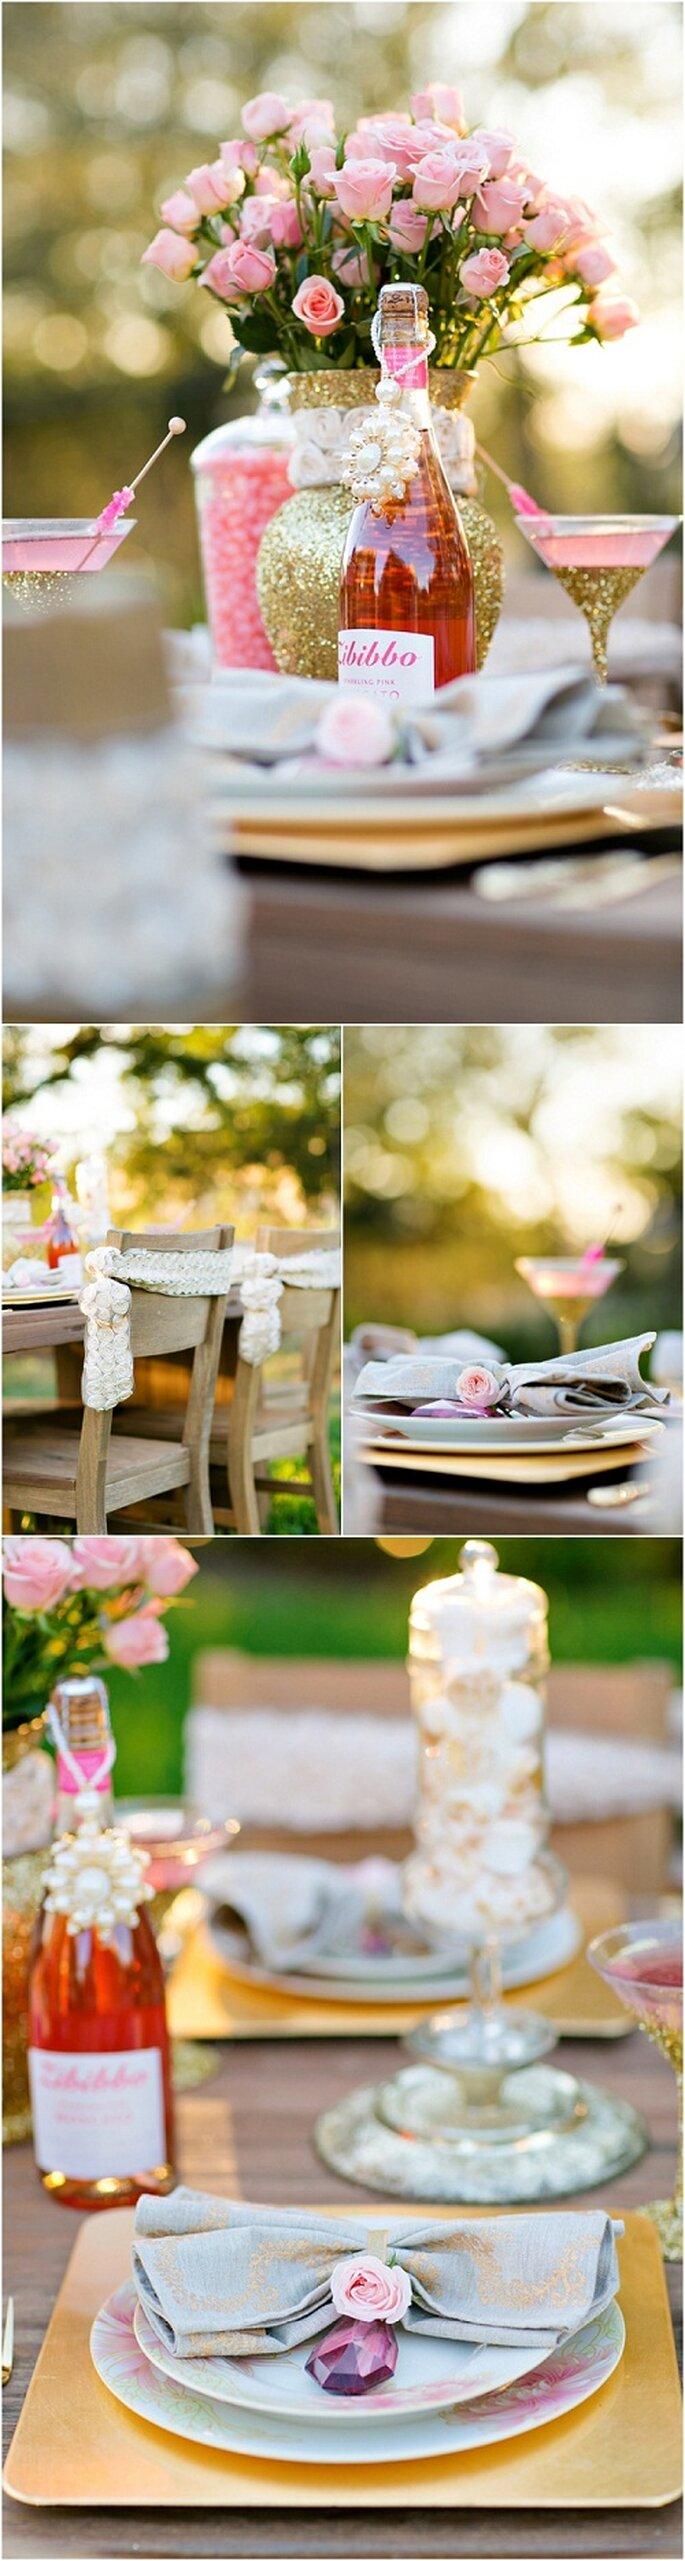 Copas de martini y centros de mesa con detalles dorados - Foto: Set Free Photography